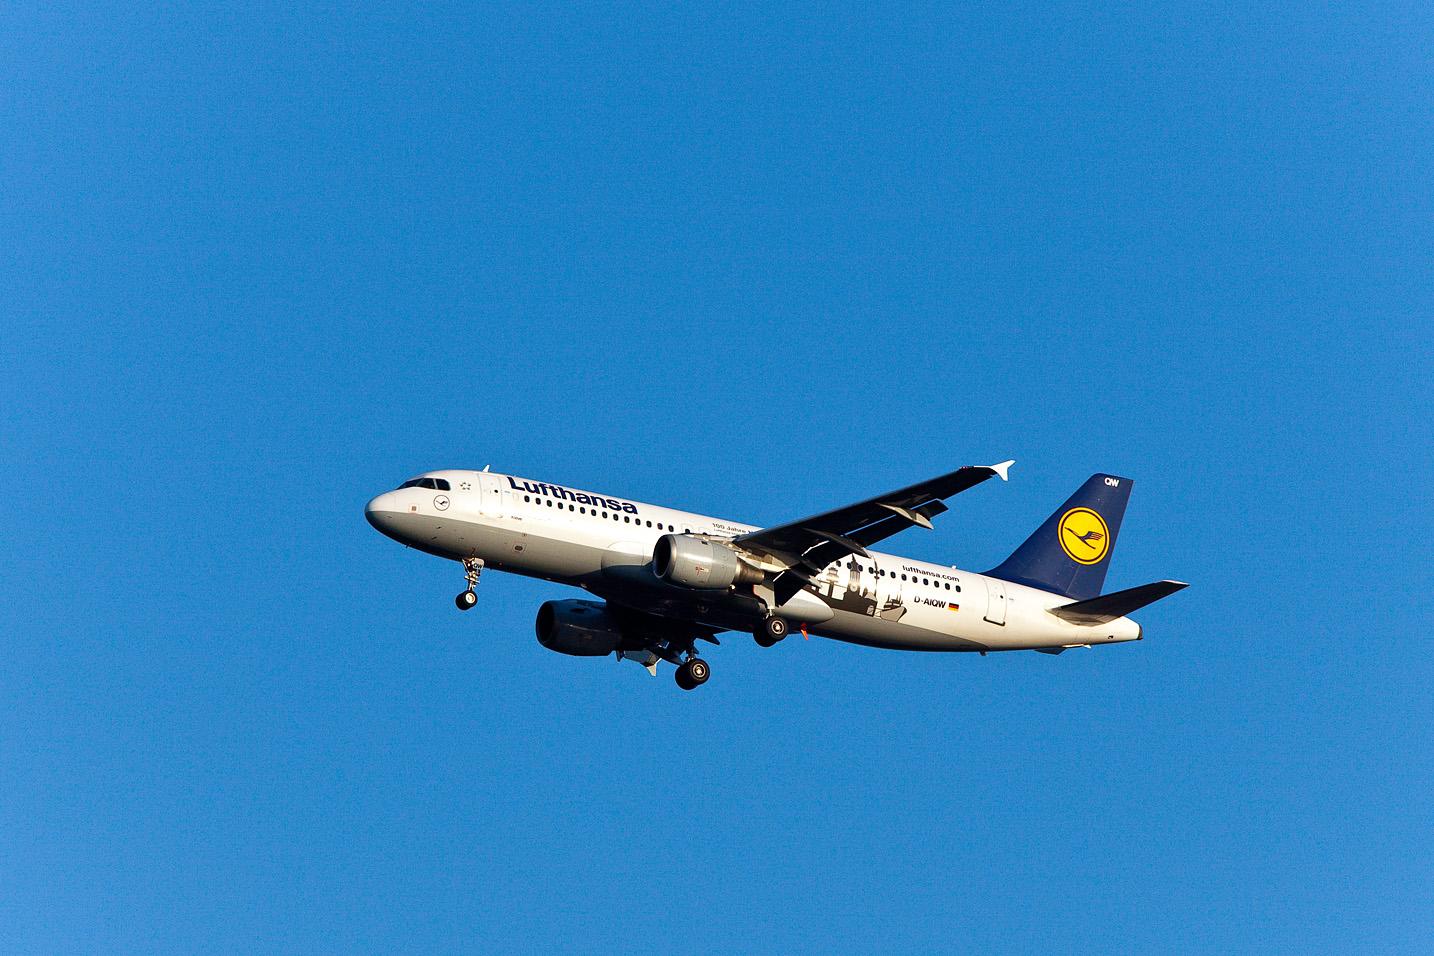 Lufthansa A320-200